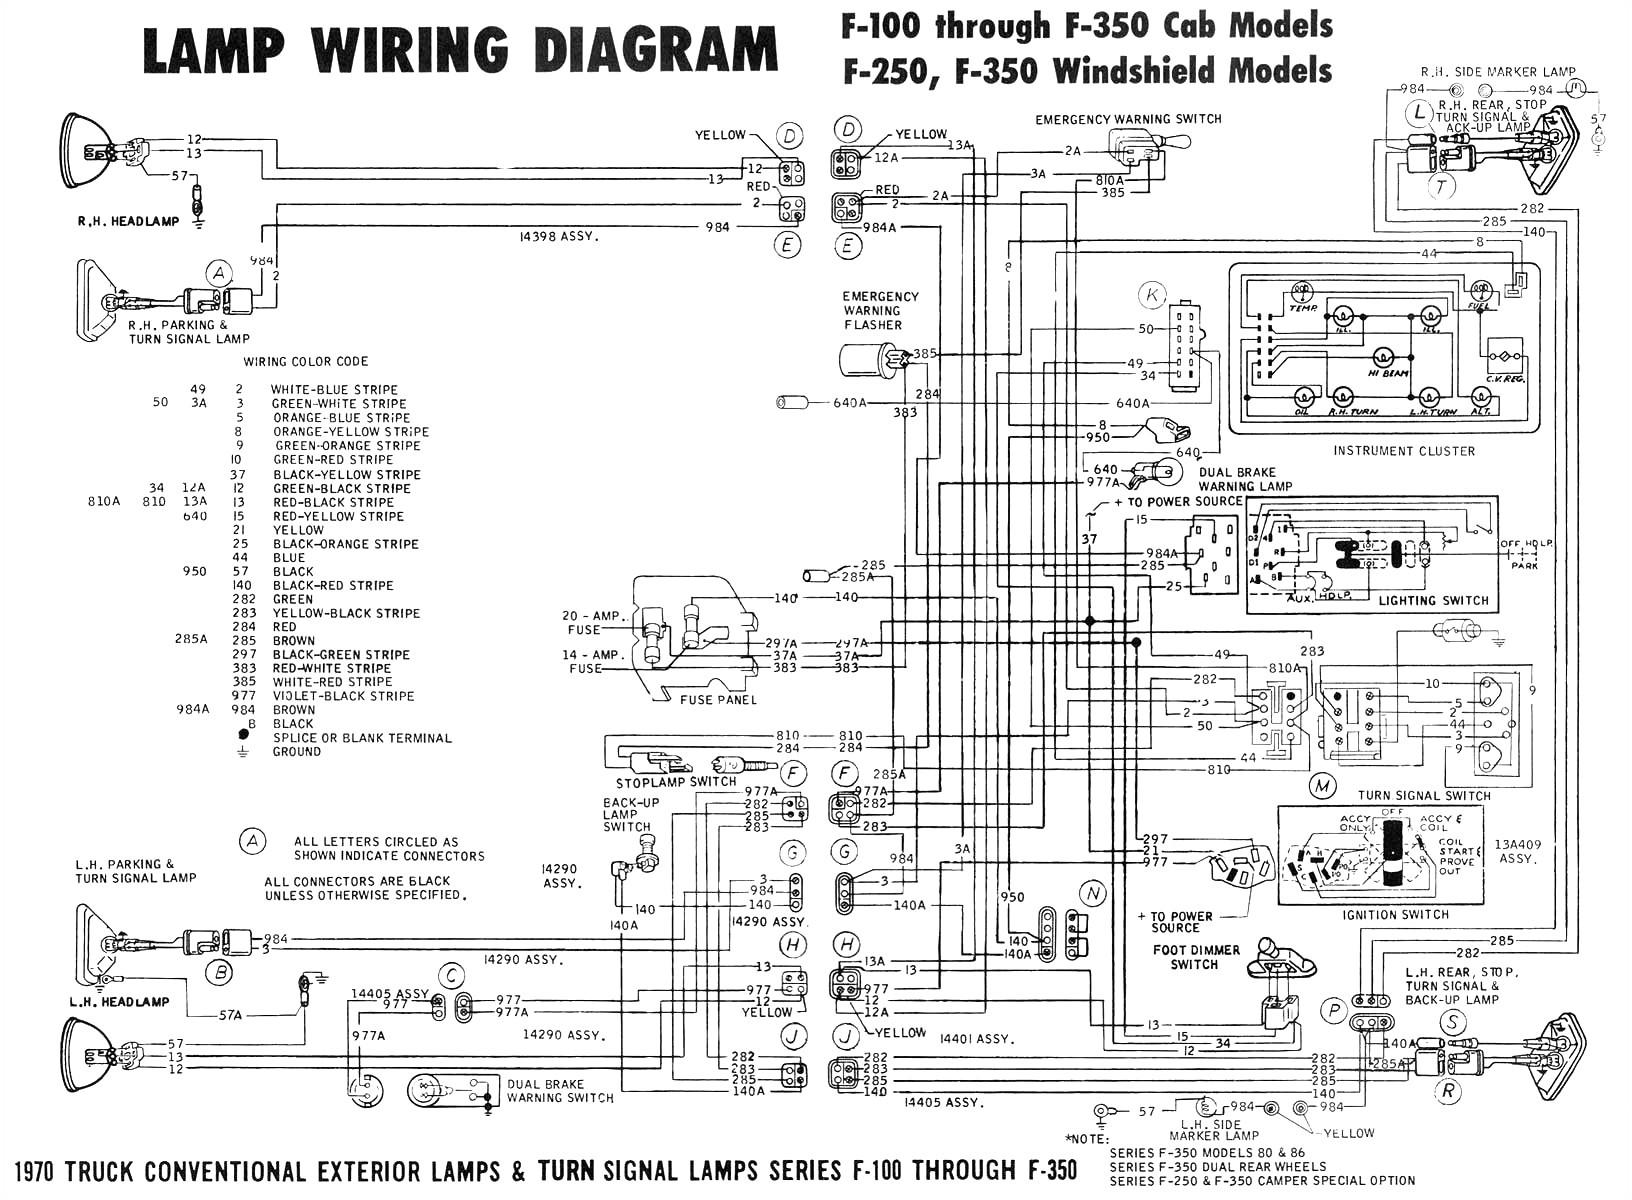 2004 kia optima engine diagram moreover car front suspension diagram wiring diagrams for a 2002 impala door lock further 2004 kia optima